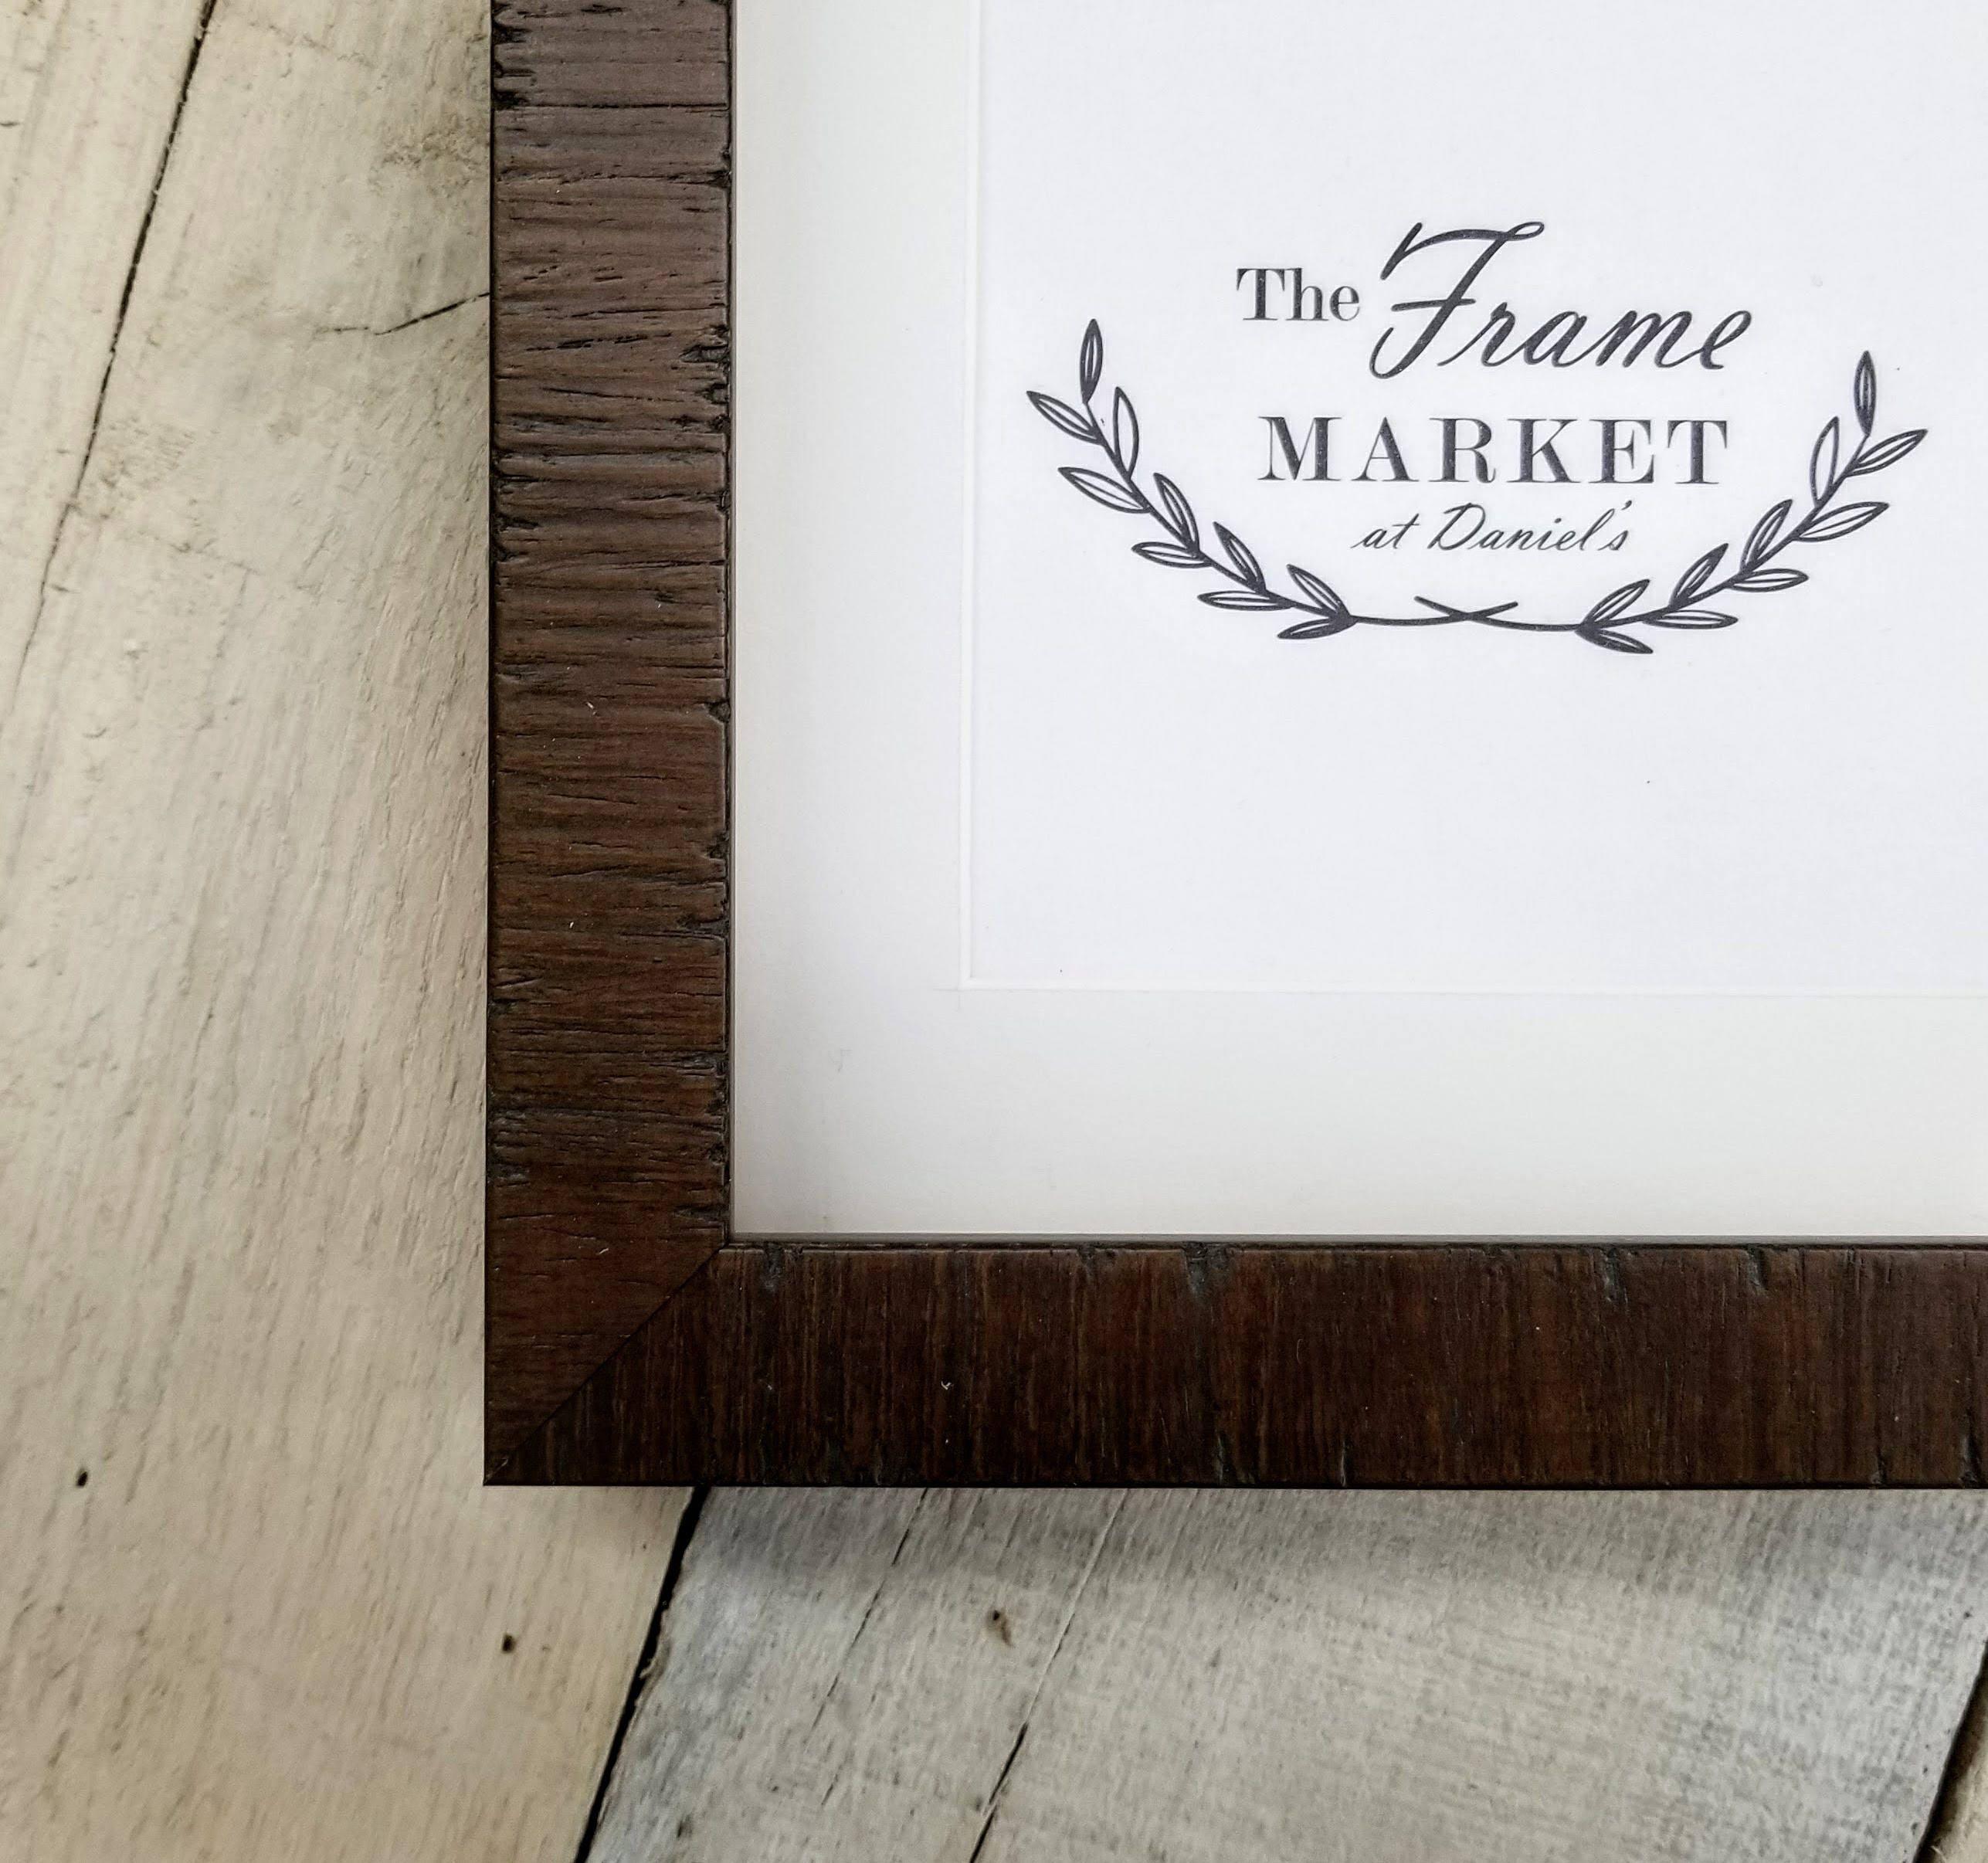 Lanais Dark Walnut Wood Picture Frame With White Mat 8x10